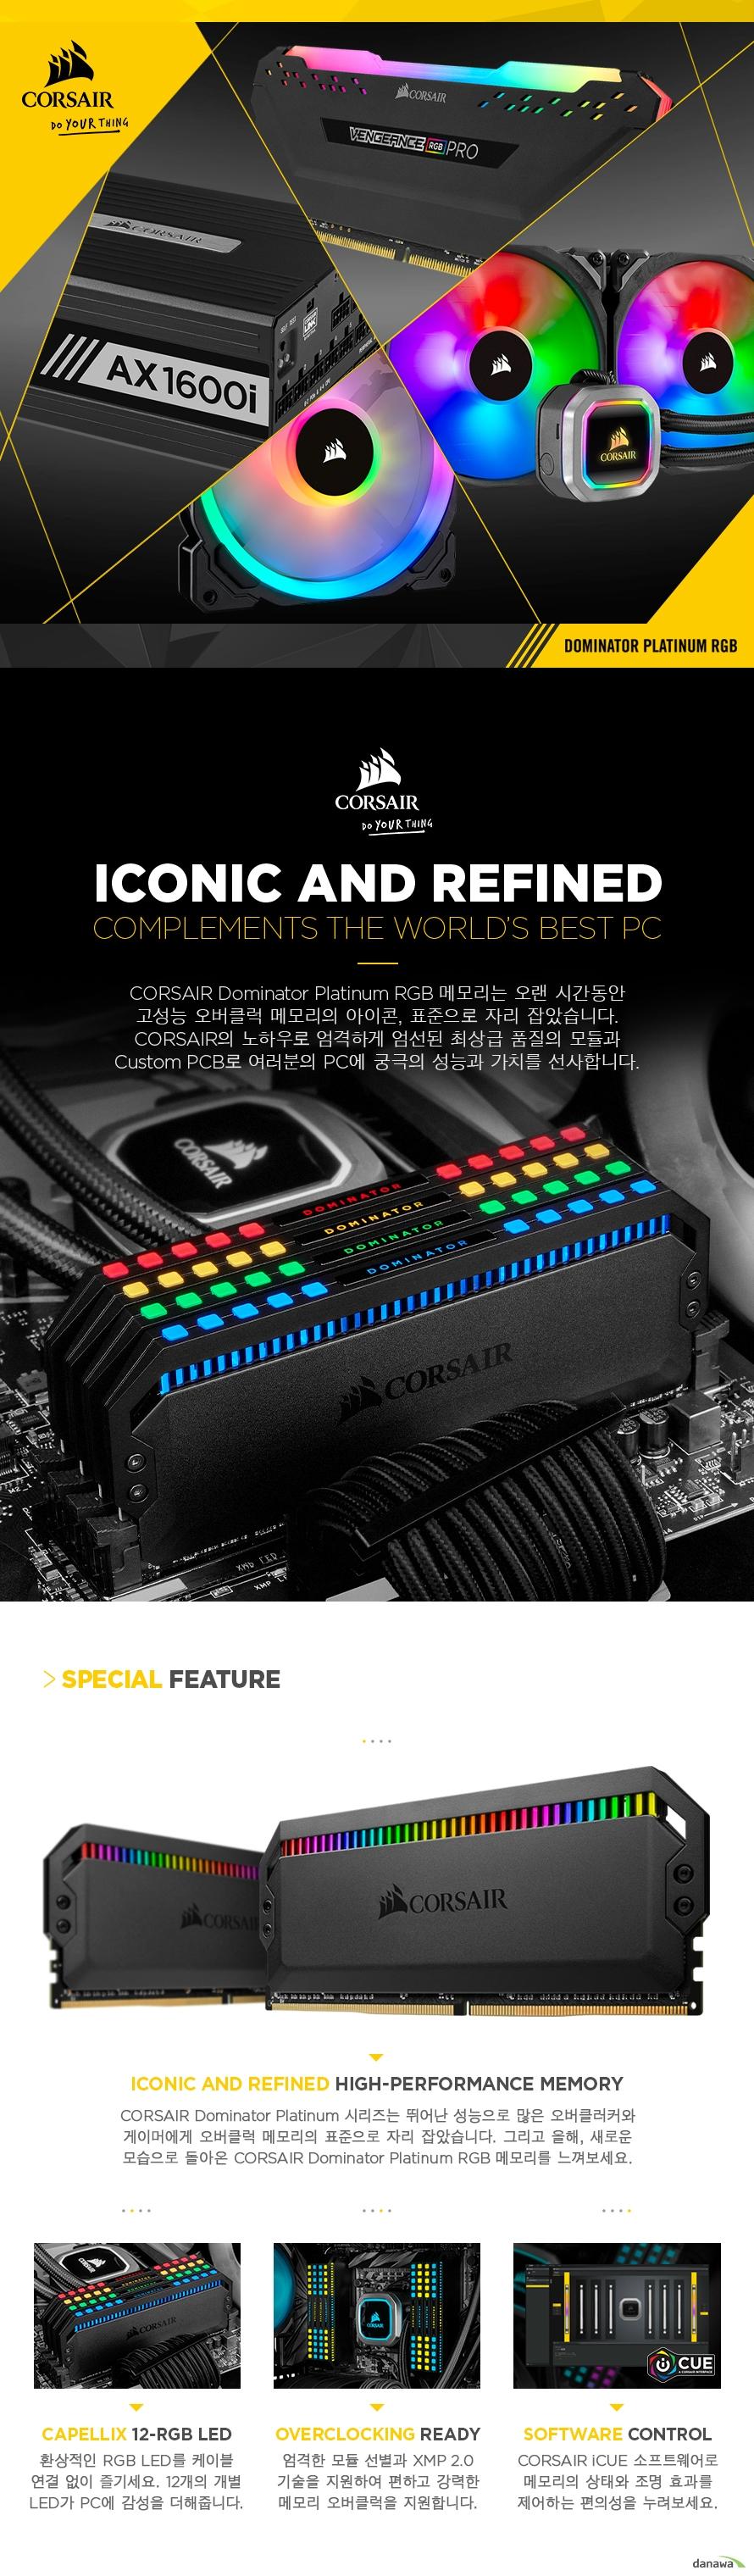 CORSAIR  DDR4 32G PC4-25600 CL16 Dominator Platinum RGB AMD (8Gx4)